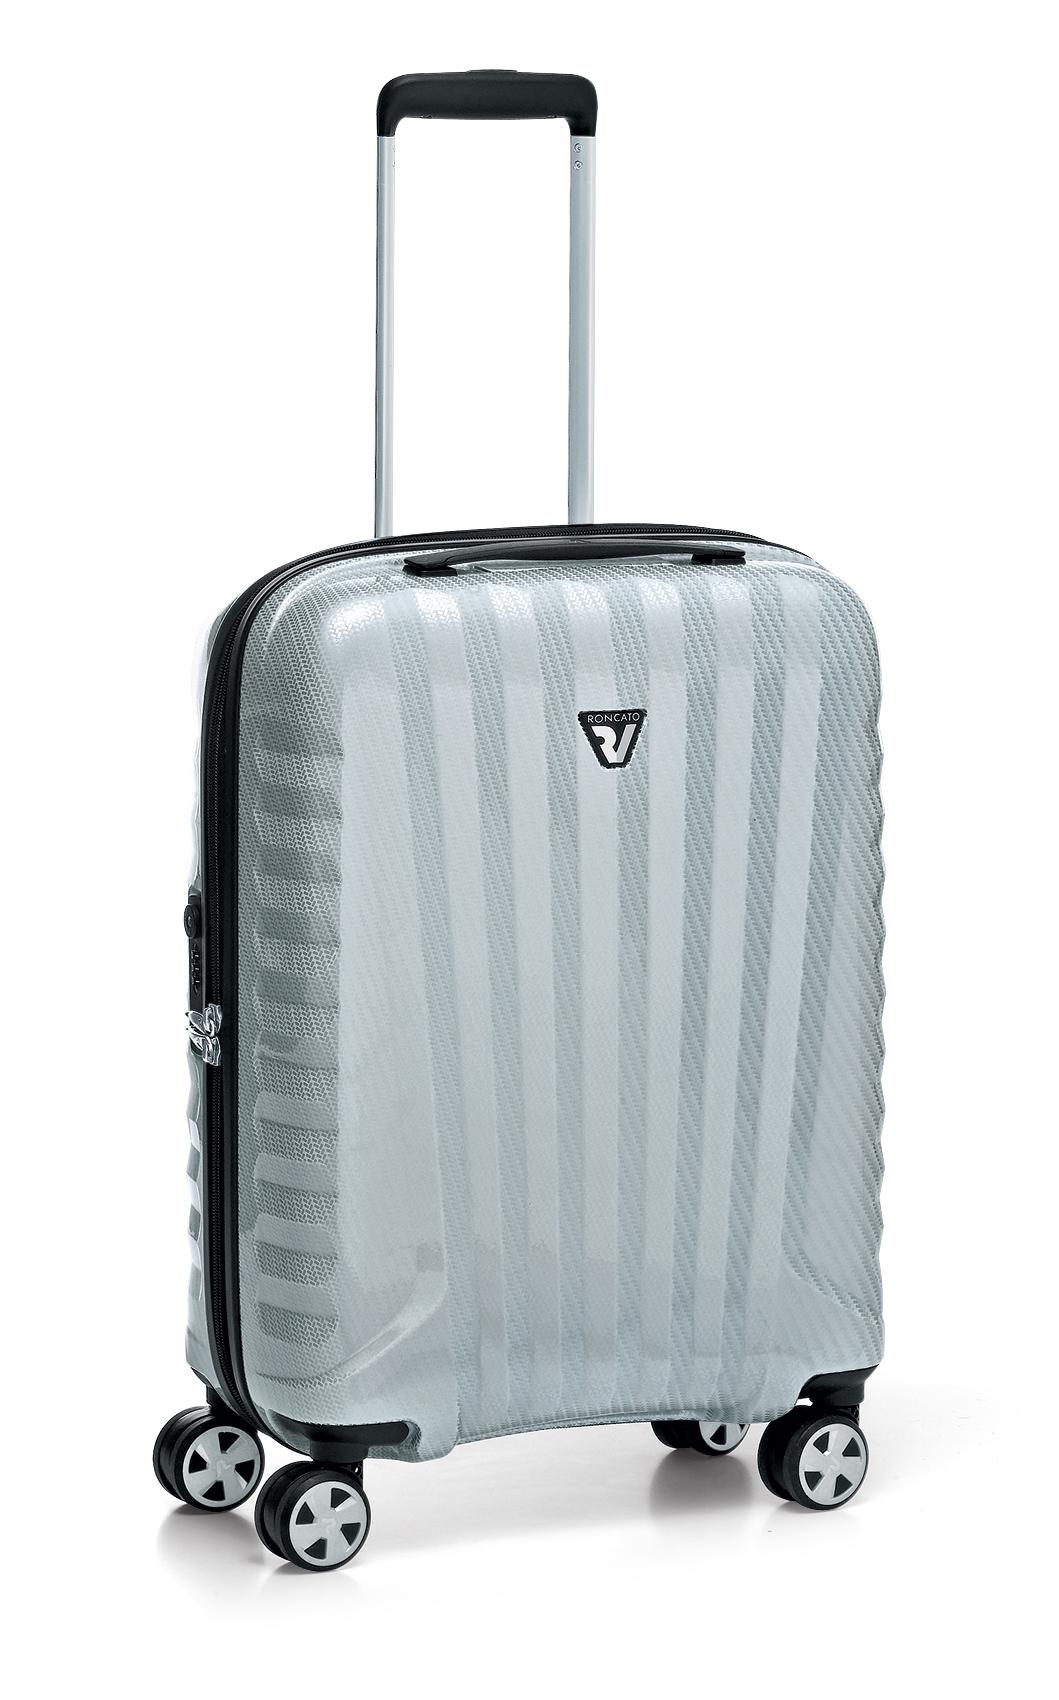 Roncato Italian Designer Premium Carbon 4 Wheel Cabin Bag - Silver